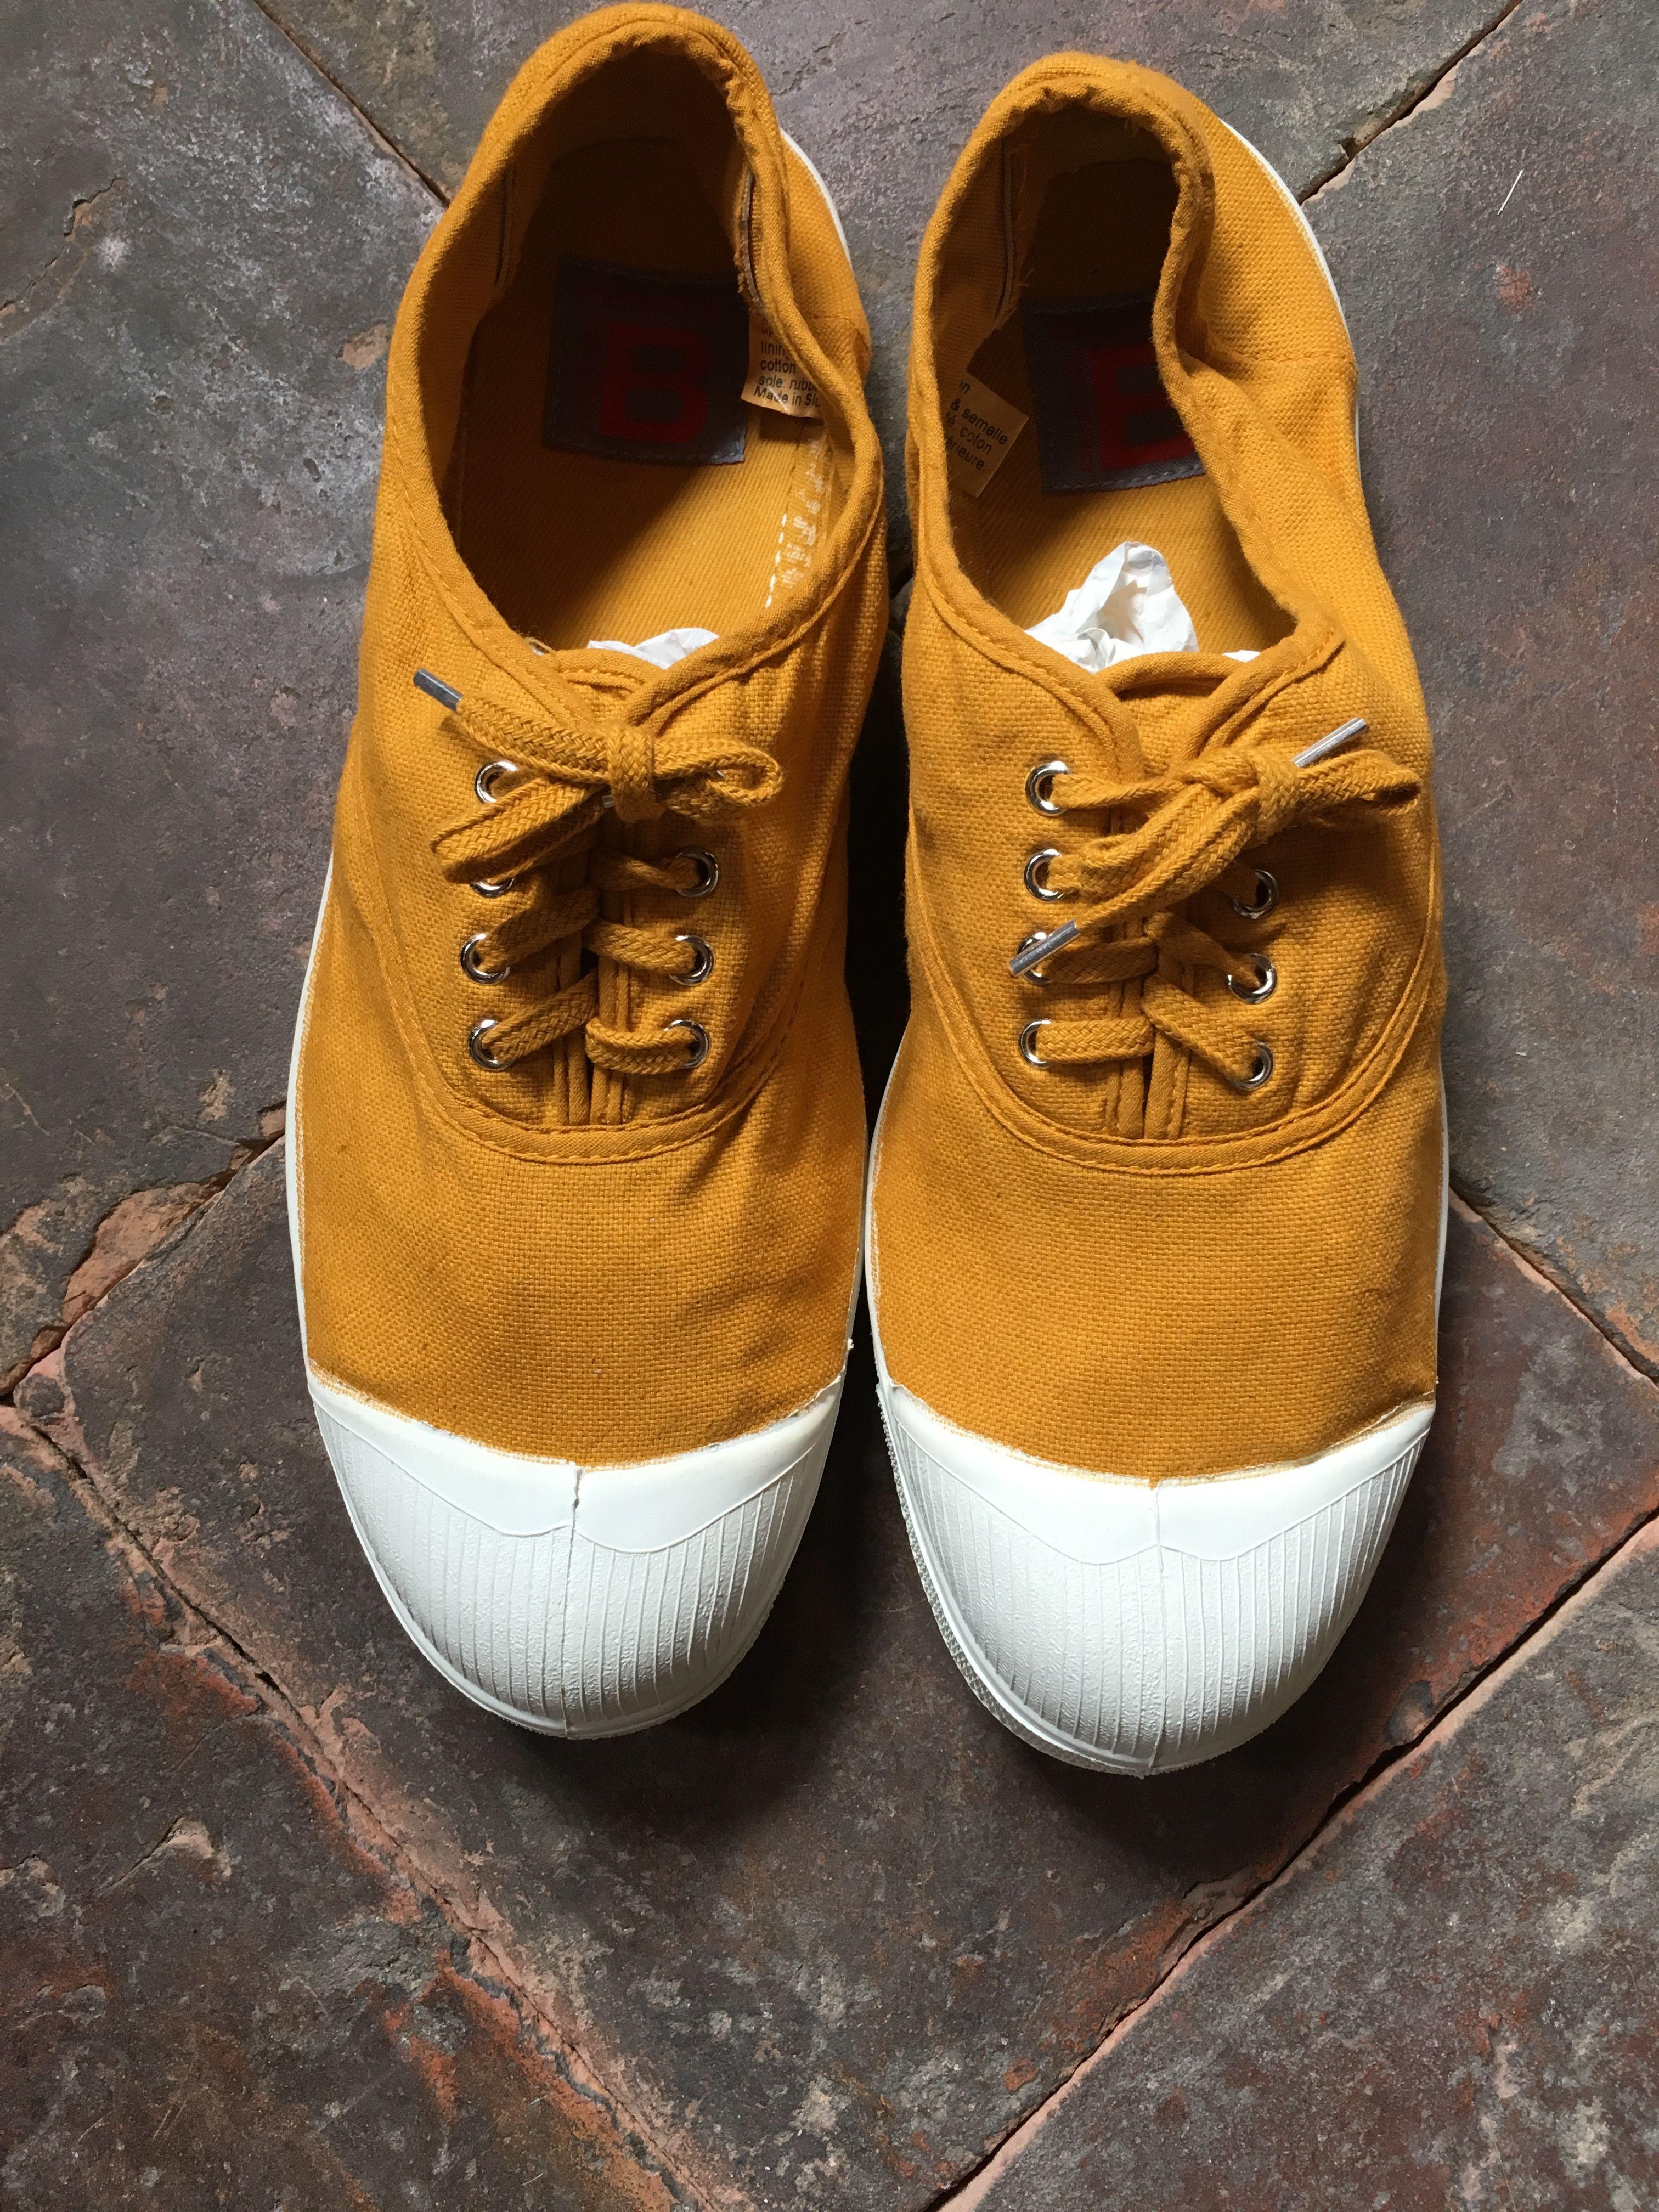 d0fbe697932 Ben Simon sko i en karrygul variant. Super flot til de solbrune ben/fødder